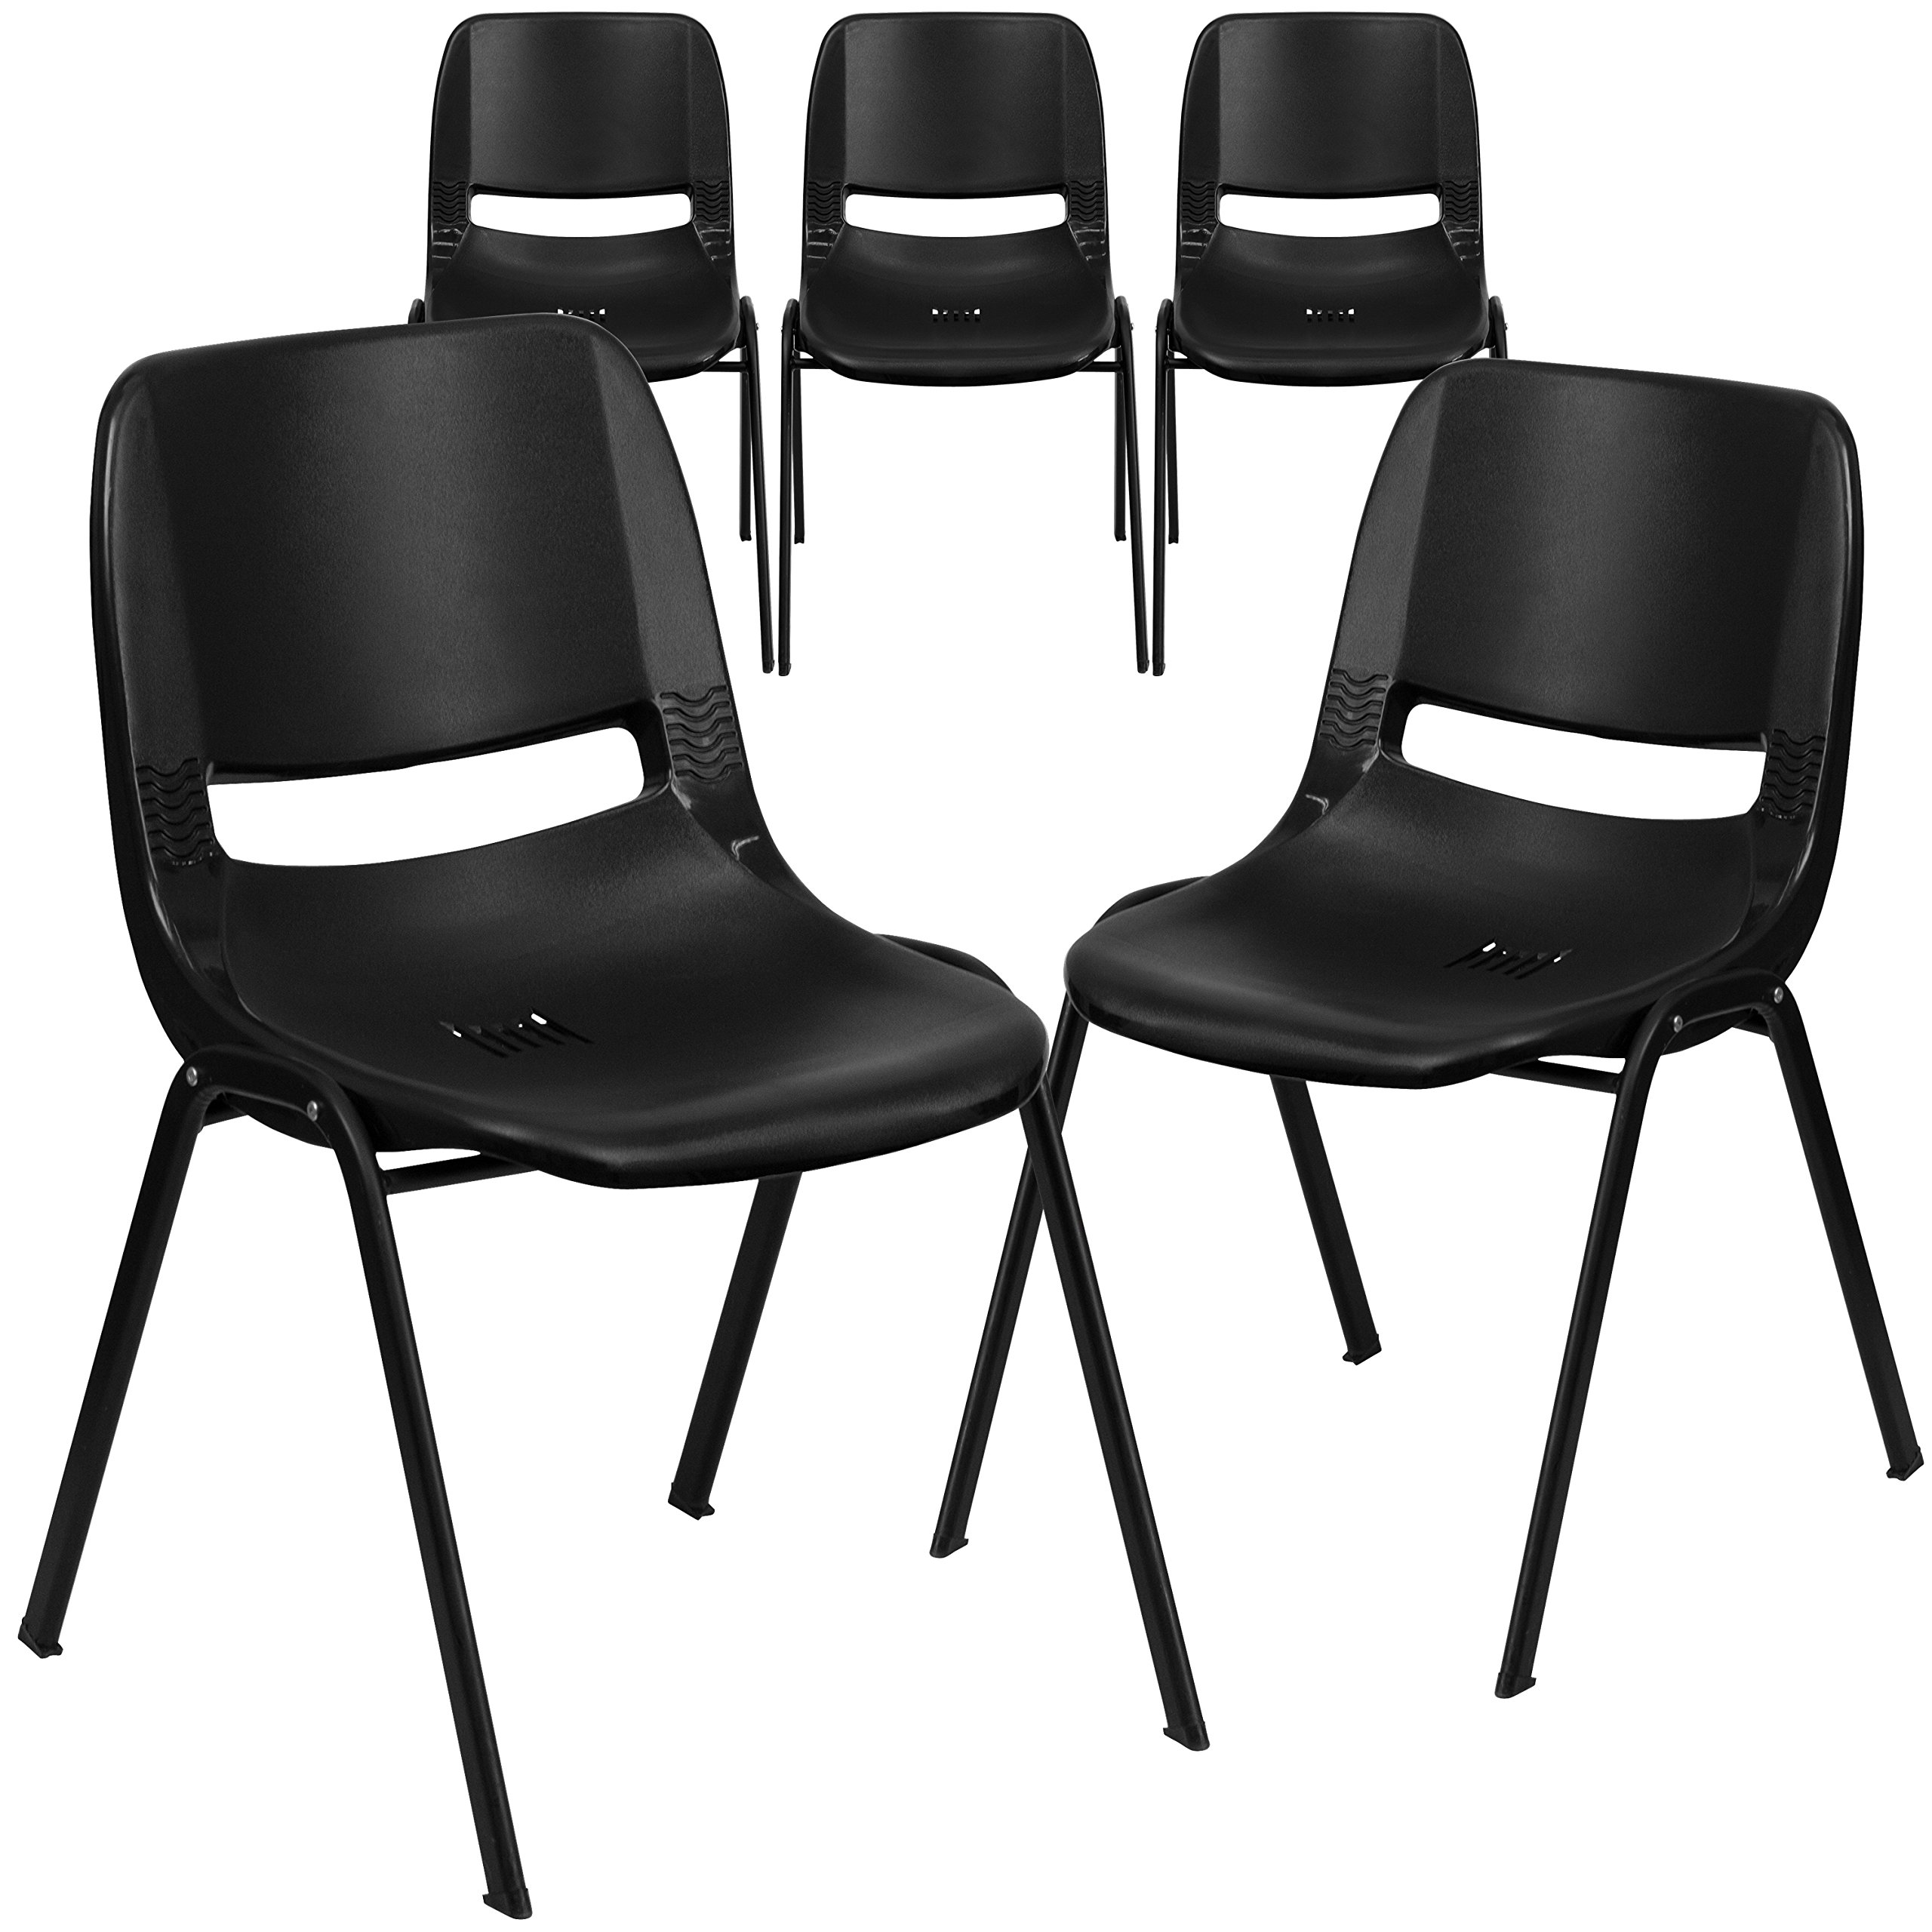 Flash Furniture 5 Pk. HERCULES Series 880 lb. Capacity Black Ergonomic Shell Stack Chair - by Flash Furniture